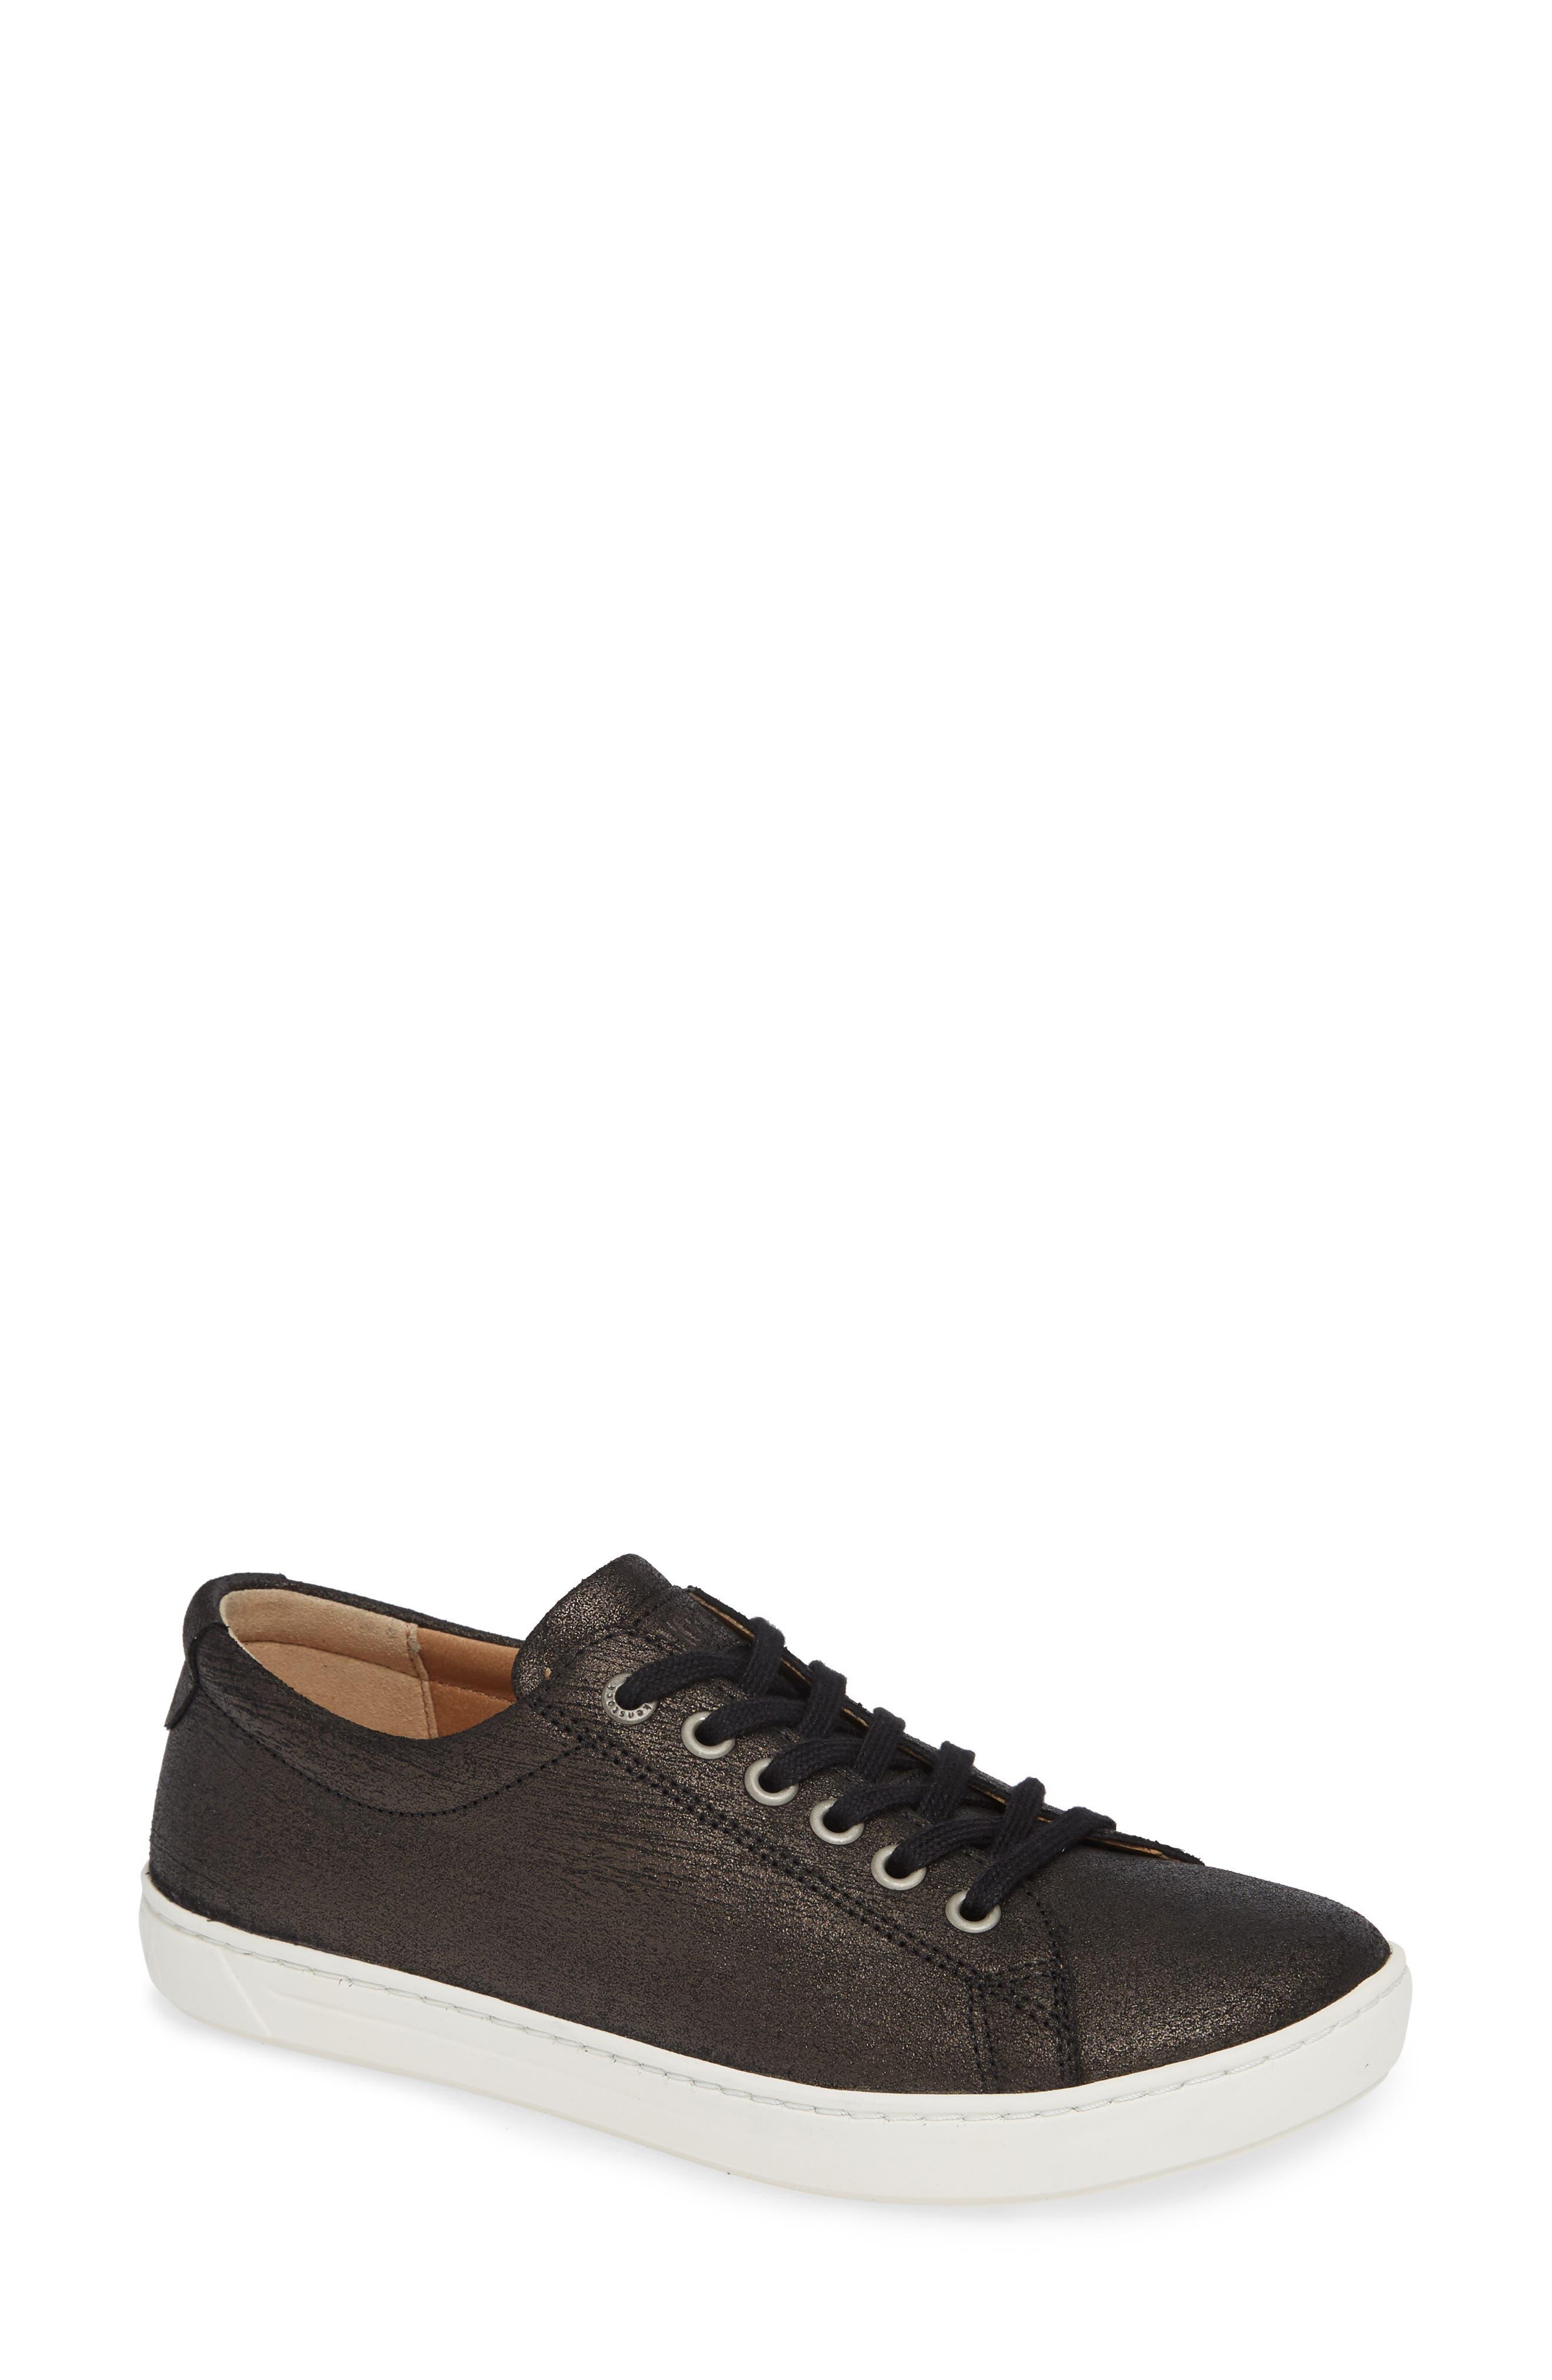 Arran Sneaker,                             Main thumbnail 1, color,                             METALLIC BLACK